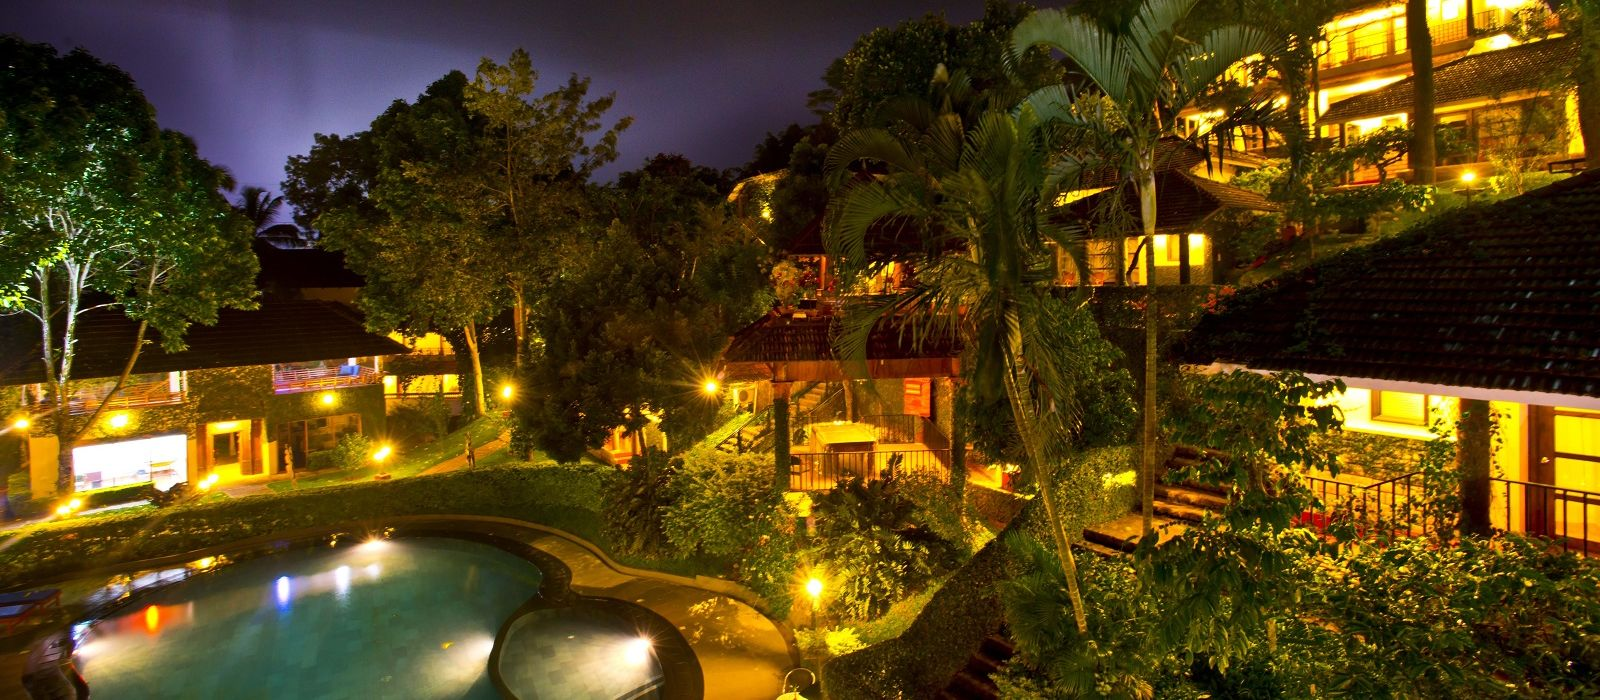 Hotel Cardamom County South India